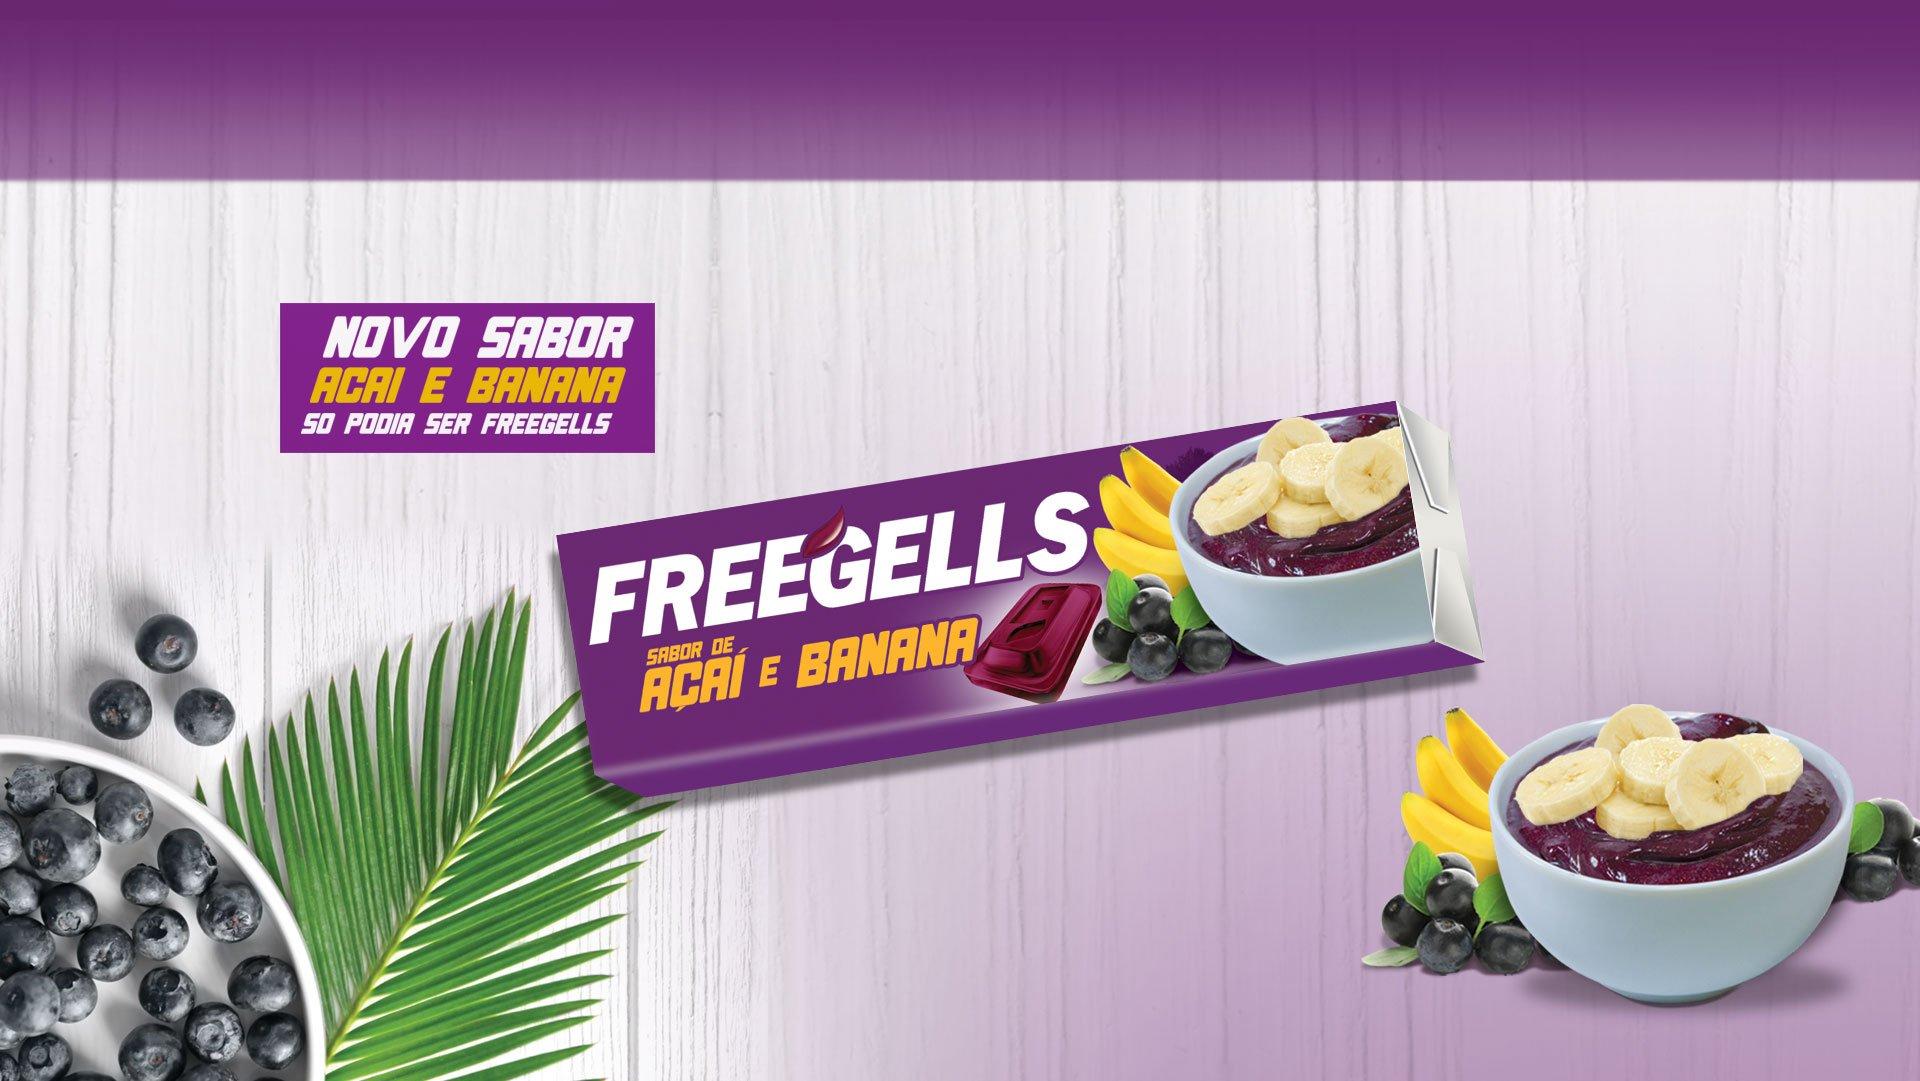 Freegells Açai e Banana